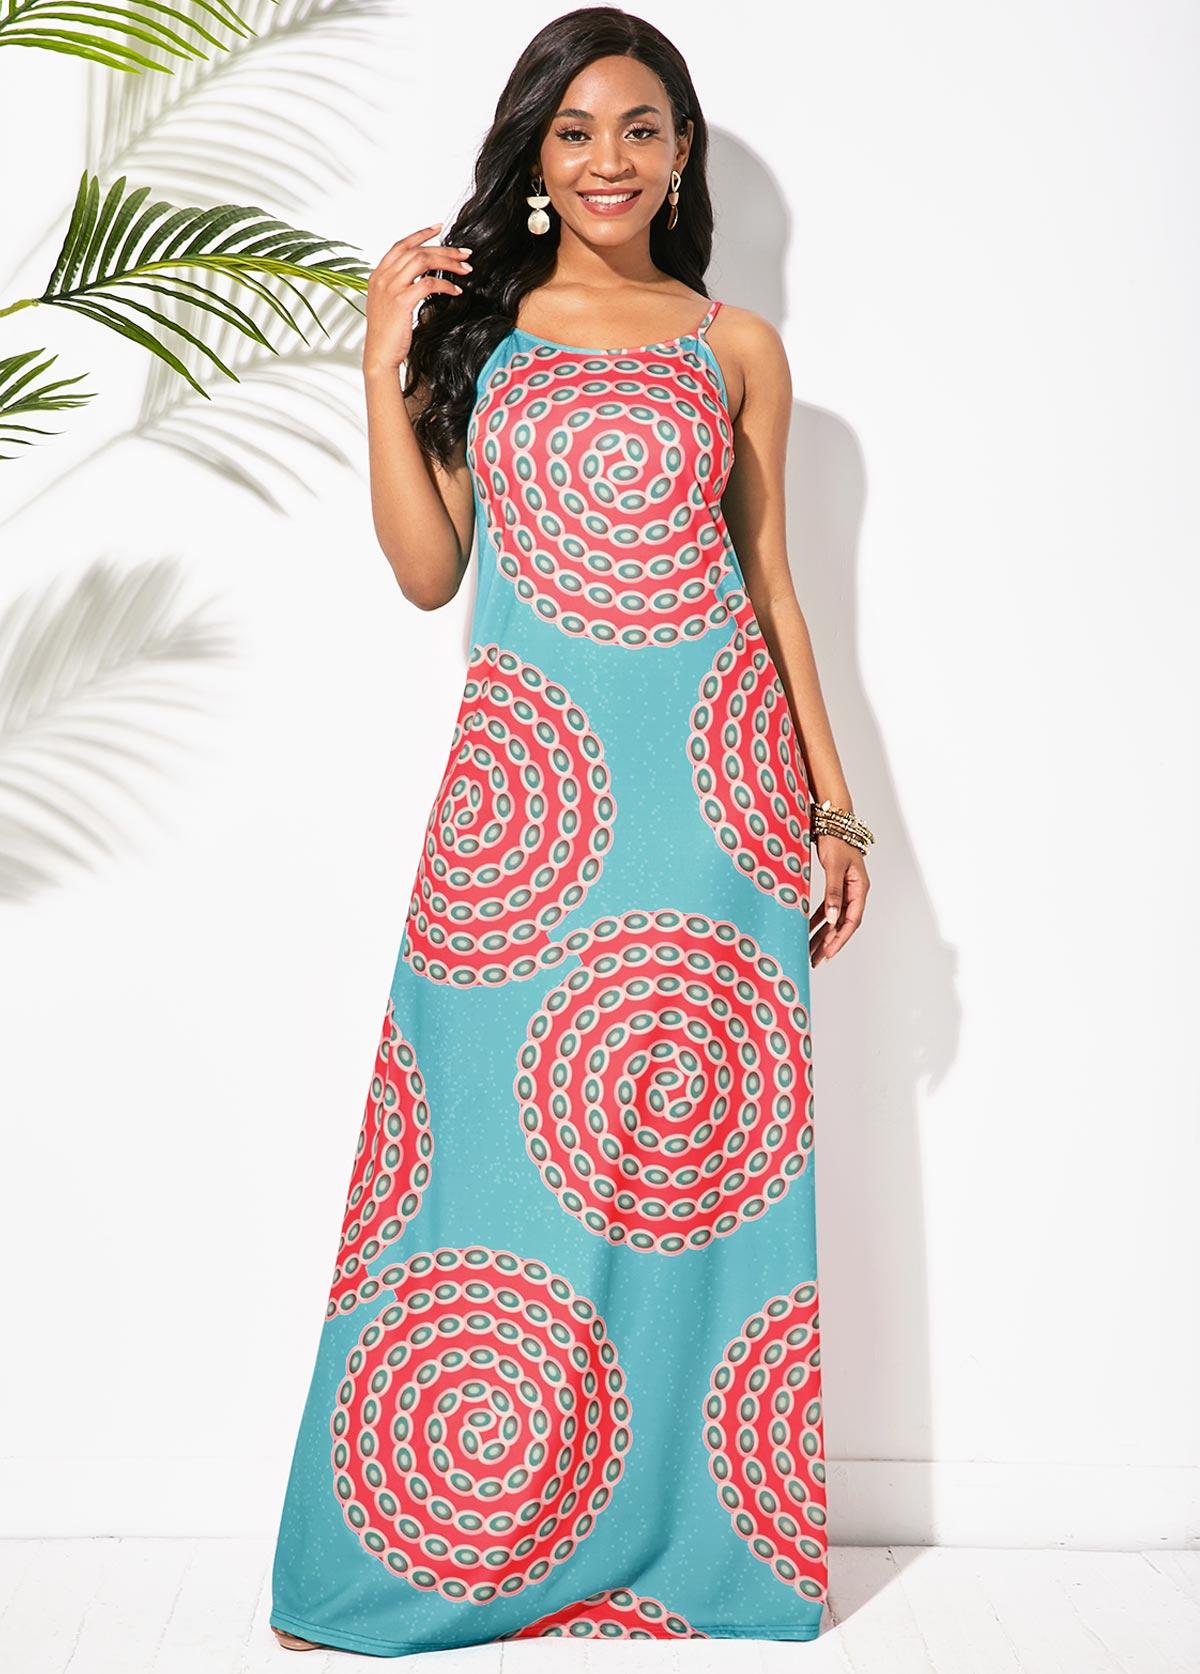 Tribal Print Round Neck Sleeveless Maxi Dress